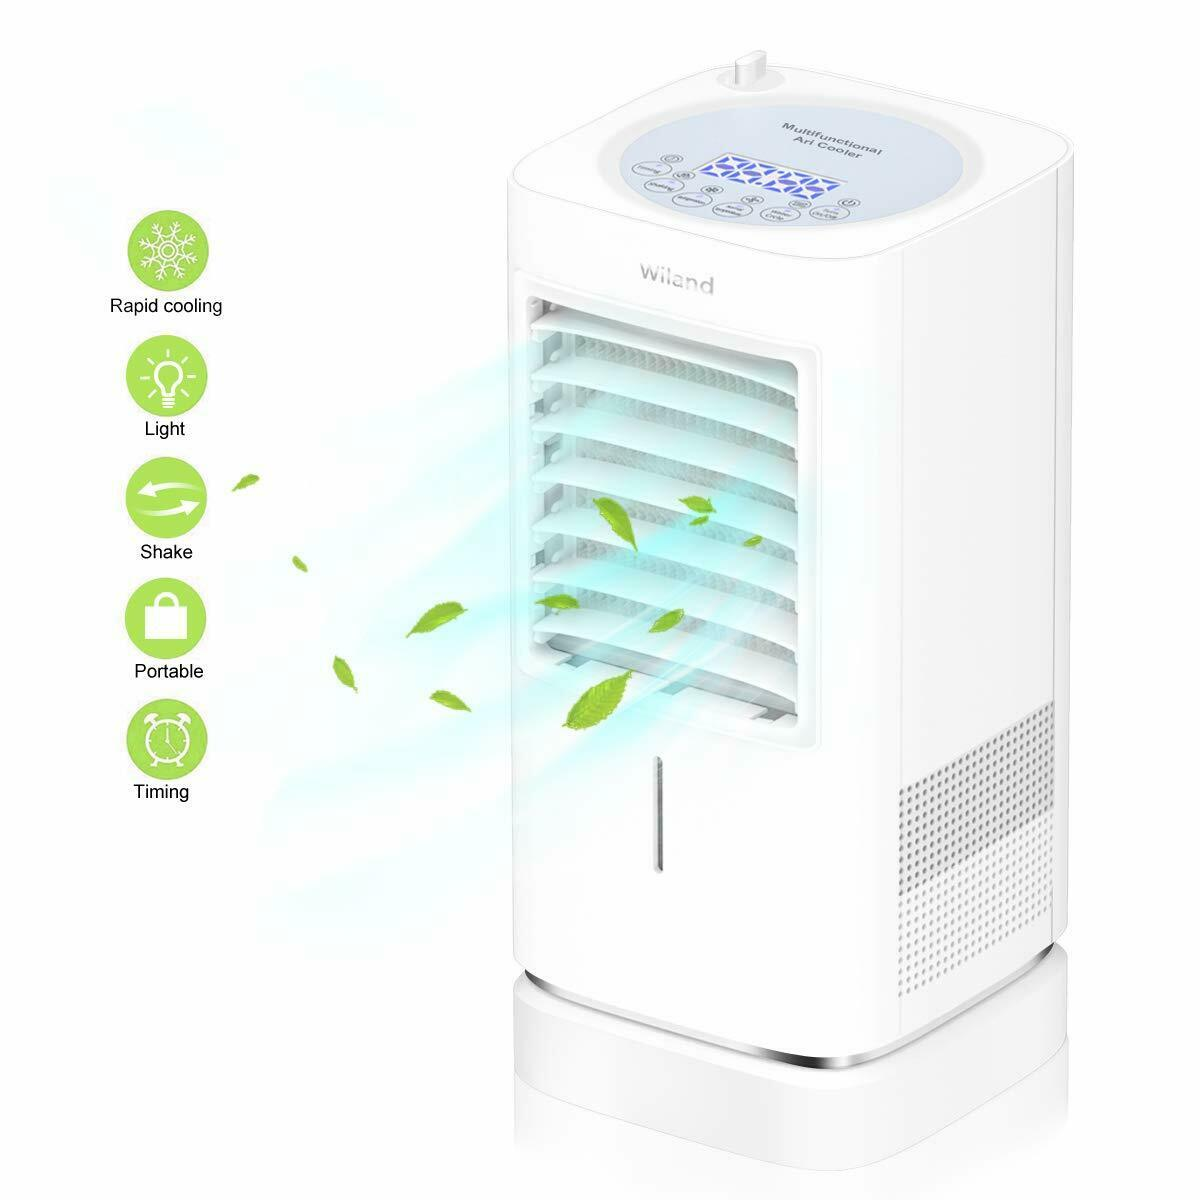 Air Cooler, Powerful Personal Air Conditioner Cooler Mini Ev